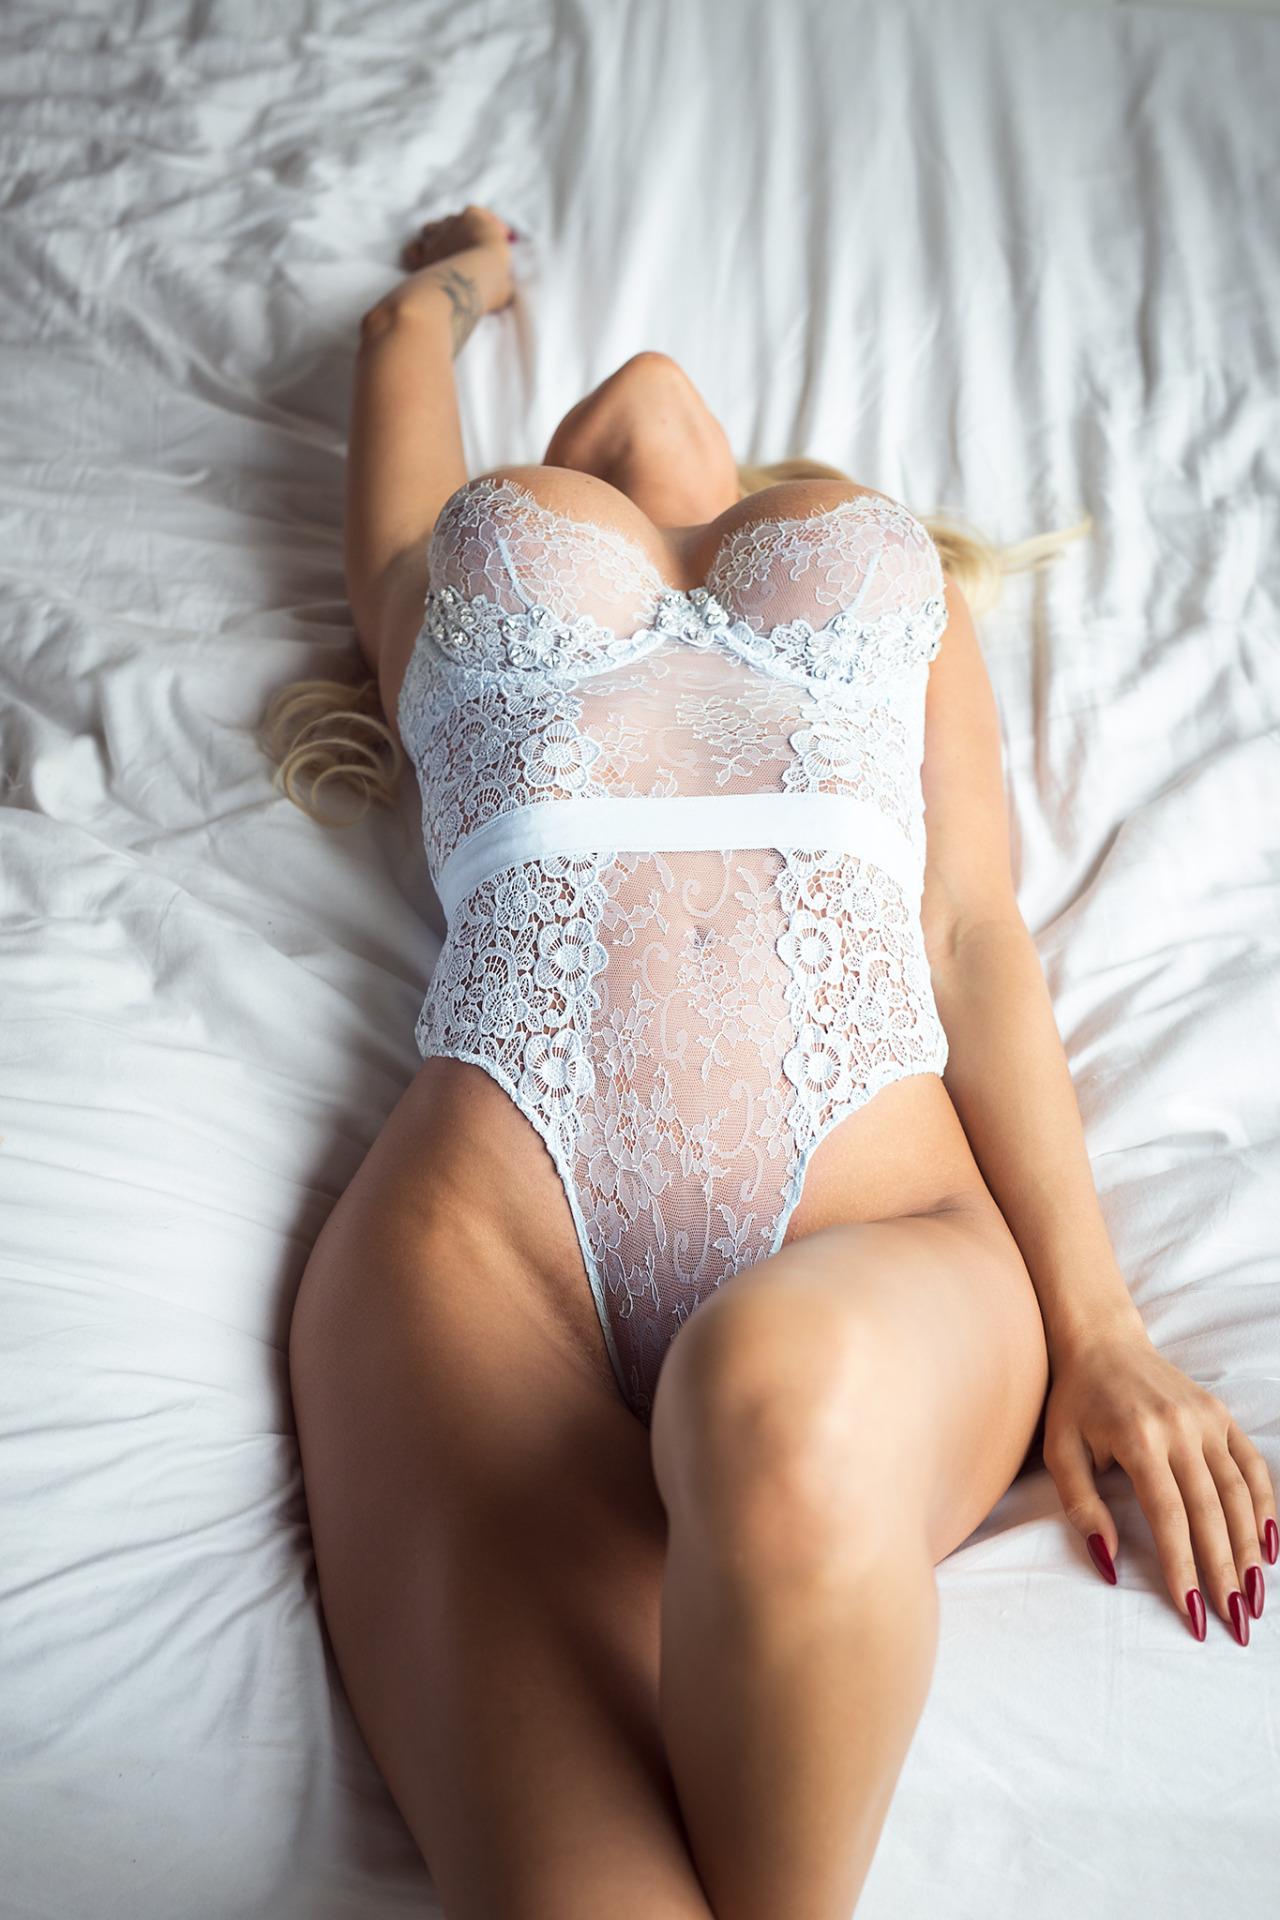 Crystal Mccallum Nude photo 28